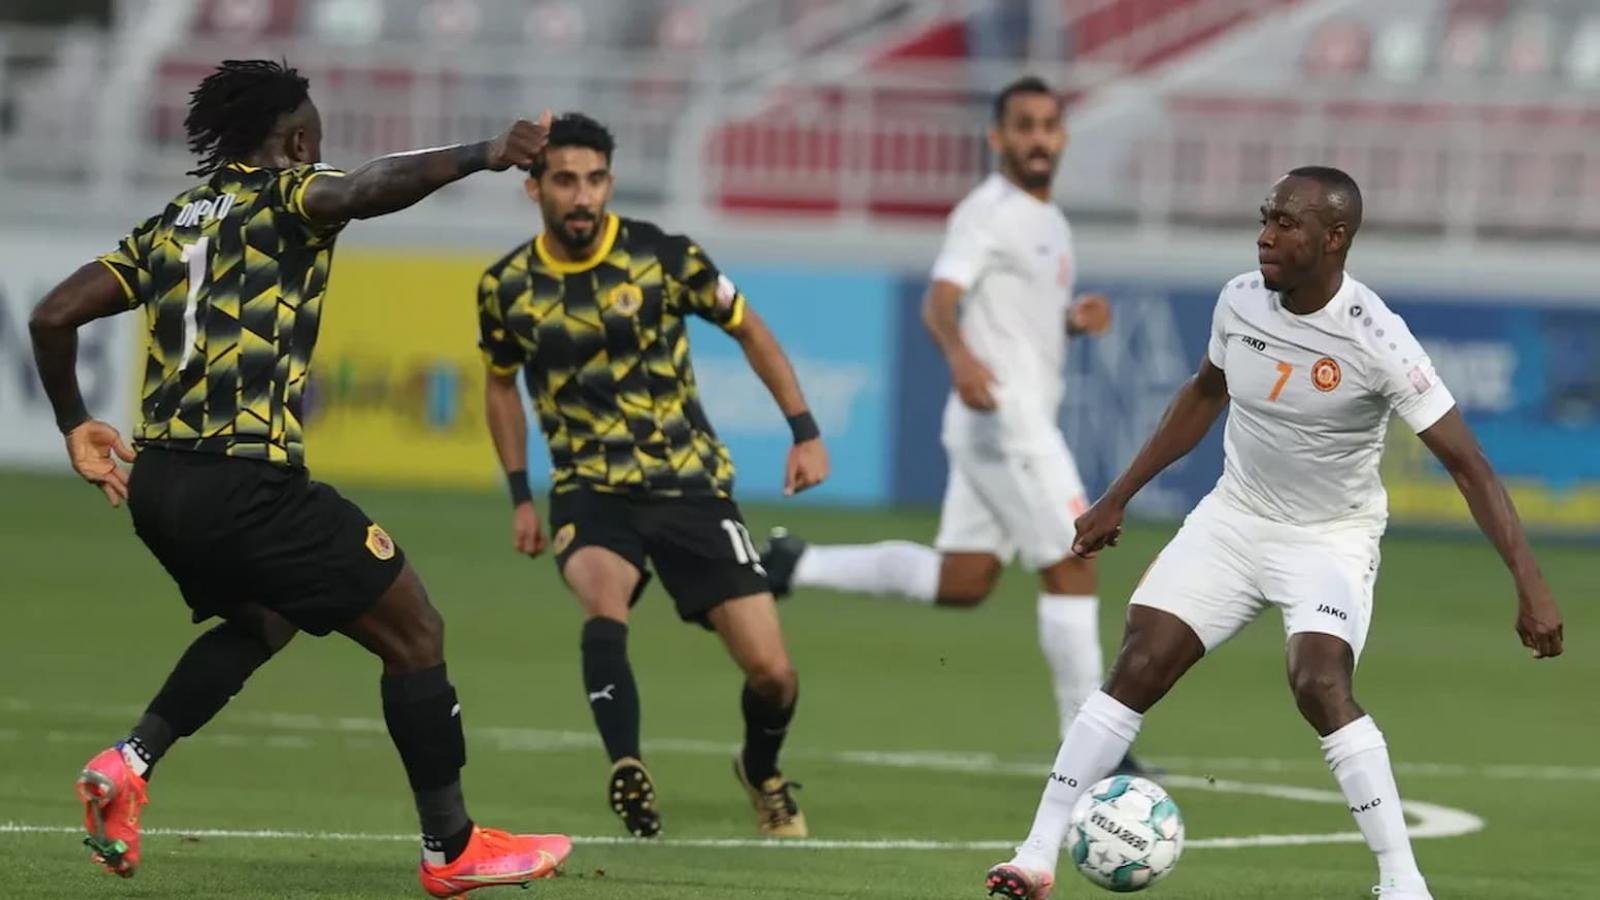 WATCH: QNB Stars League - Week 16 highlights